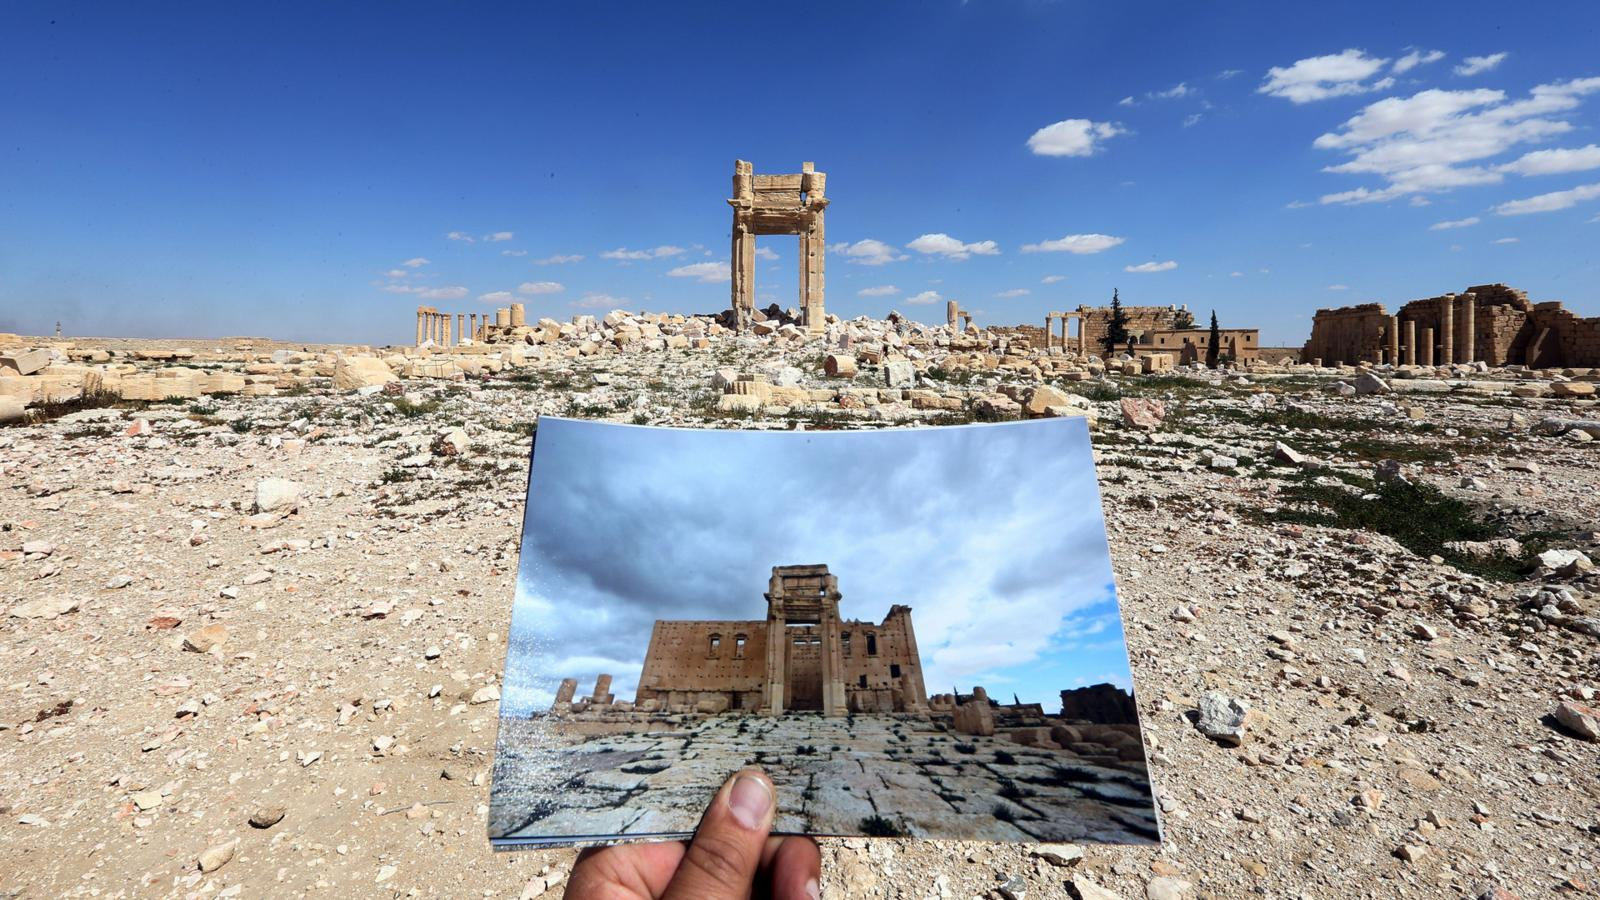 001 - SYRIA-CONFLICT-HERITAGE-PALMYRA